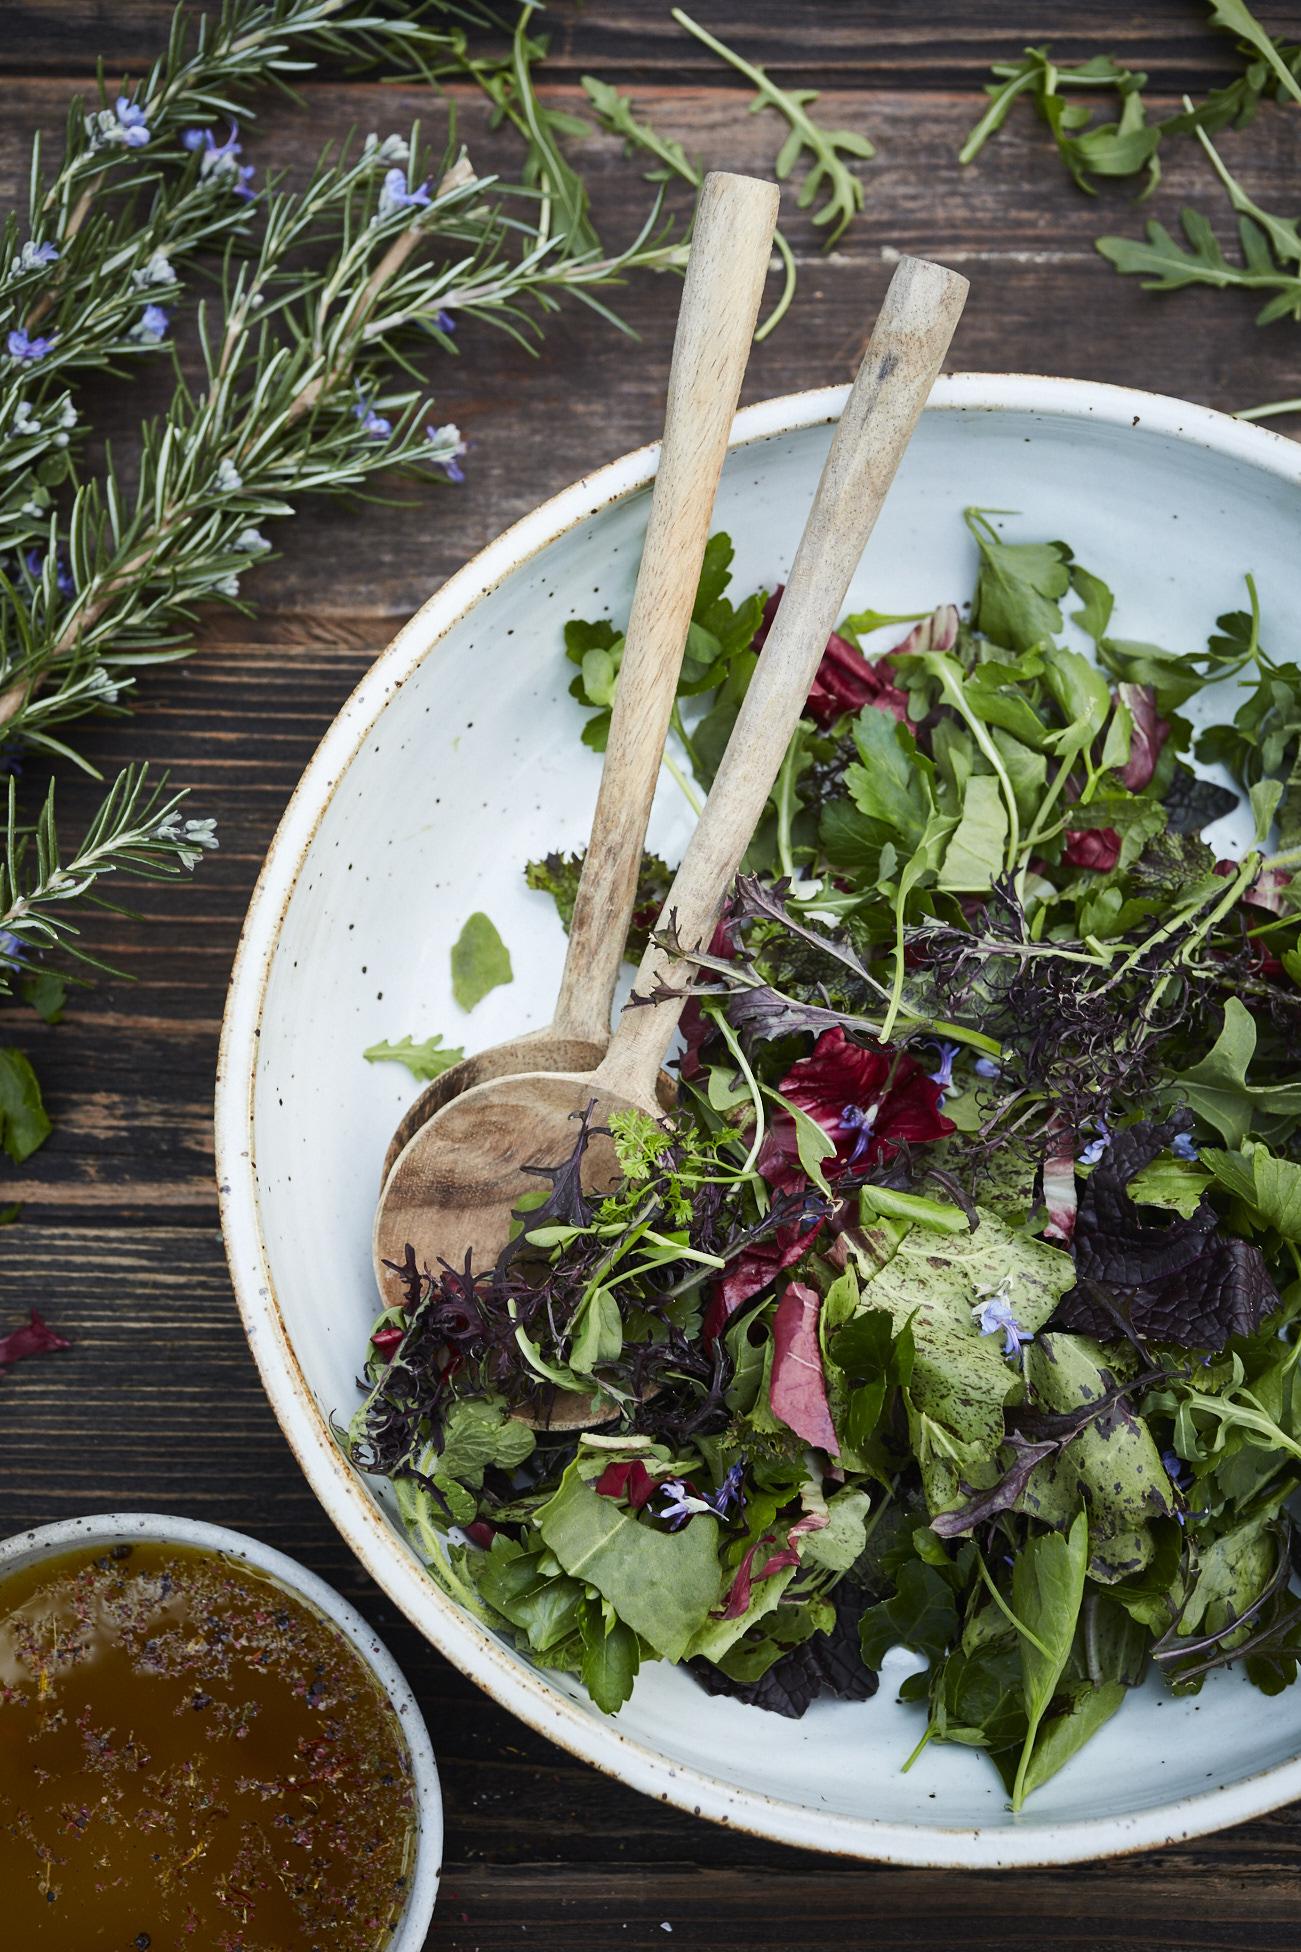 Projects-herb-salad-7534.jpg